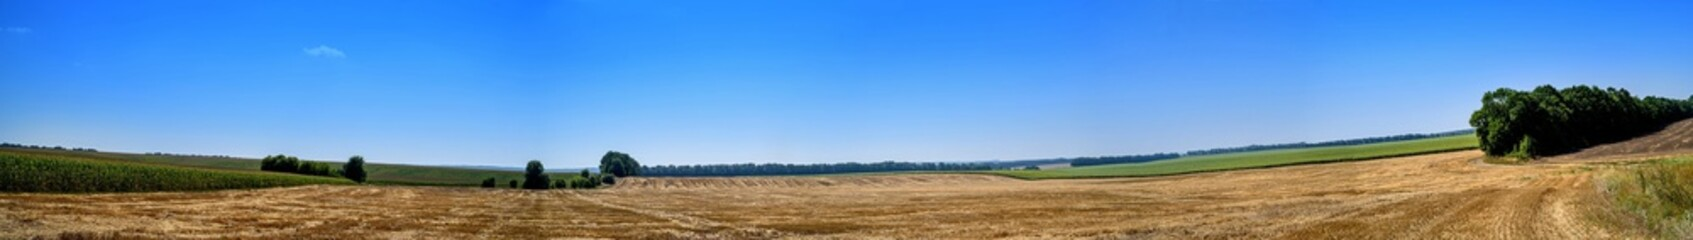 Panorama of a plowed field Fotoväggar